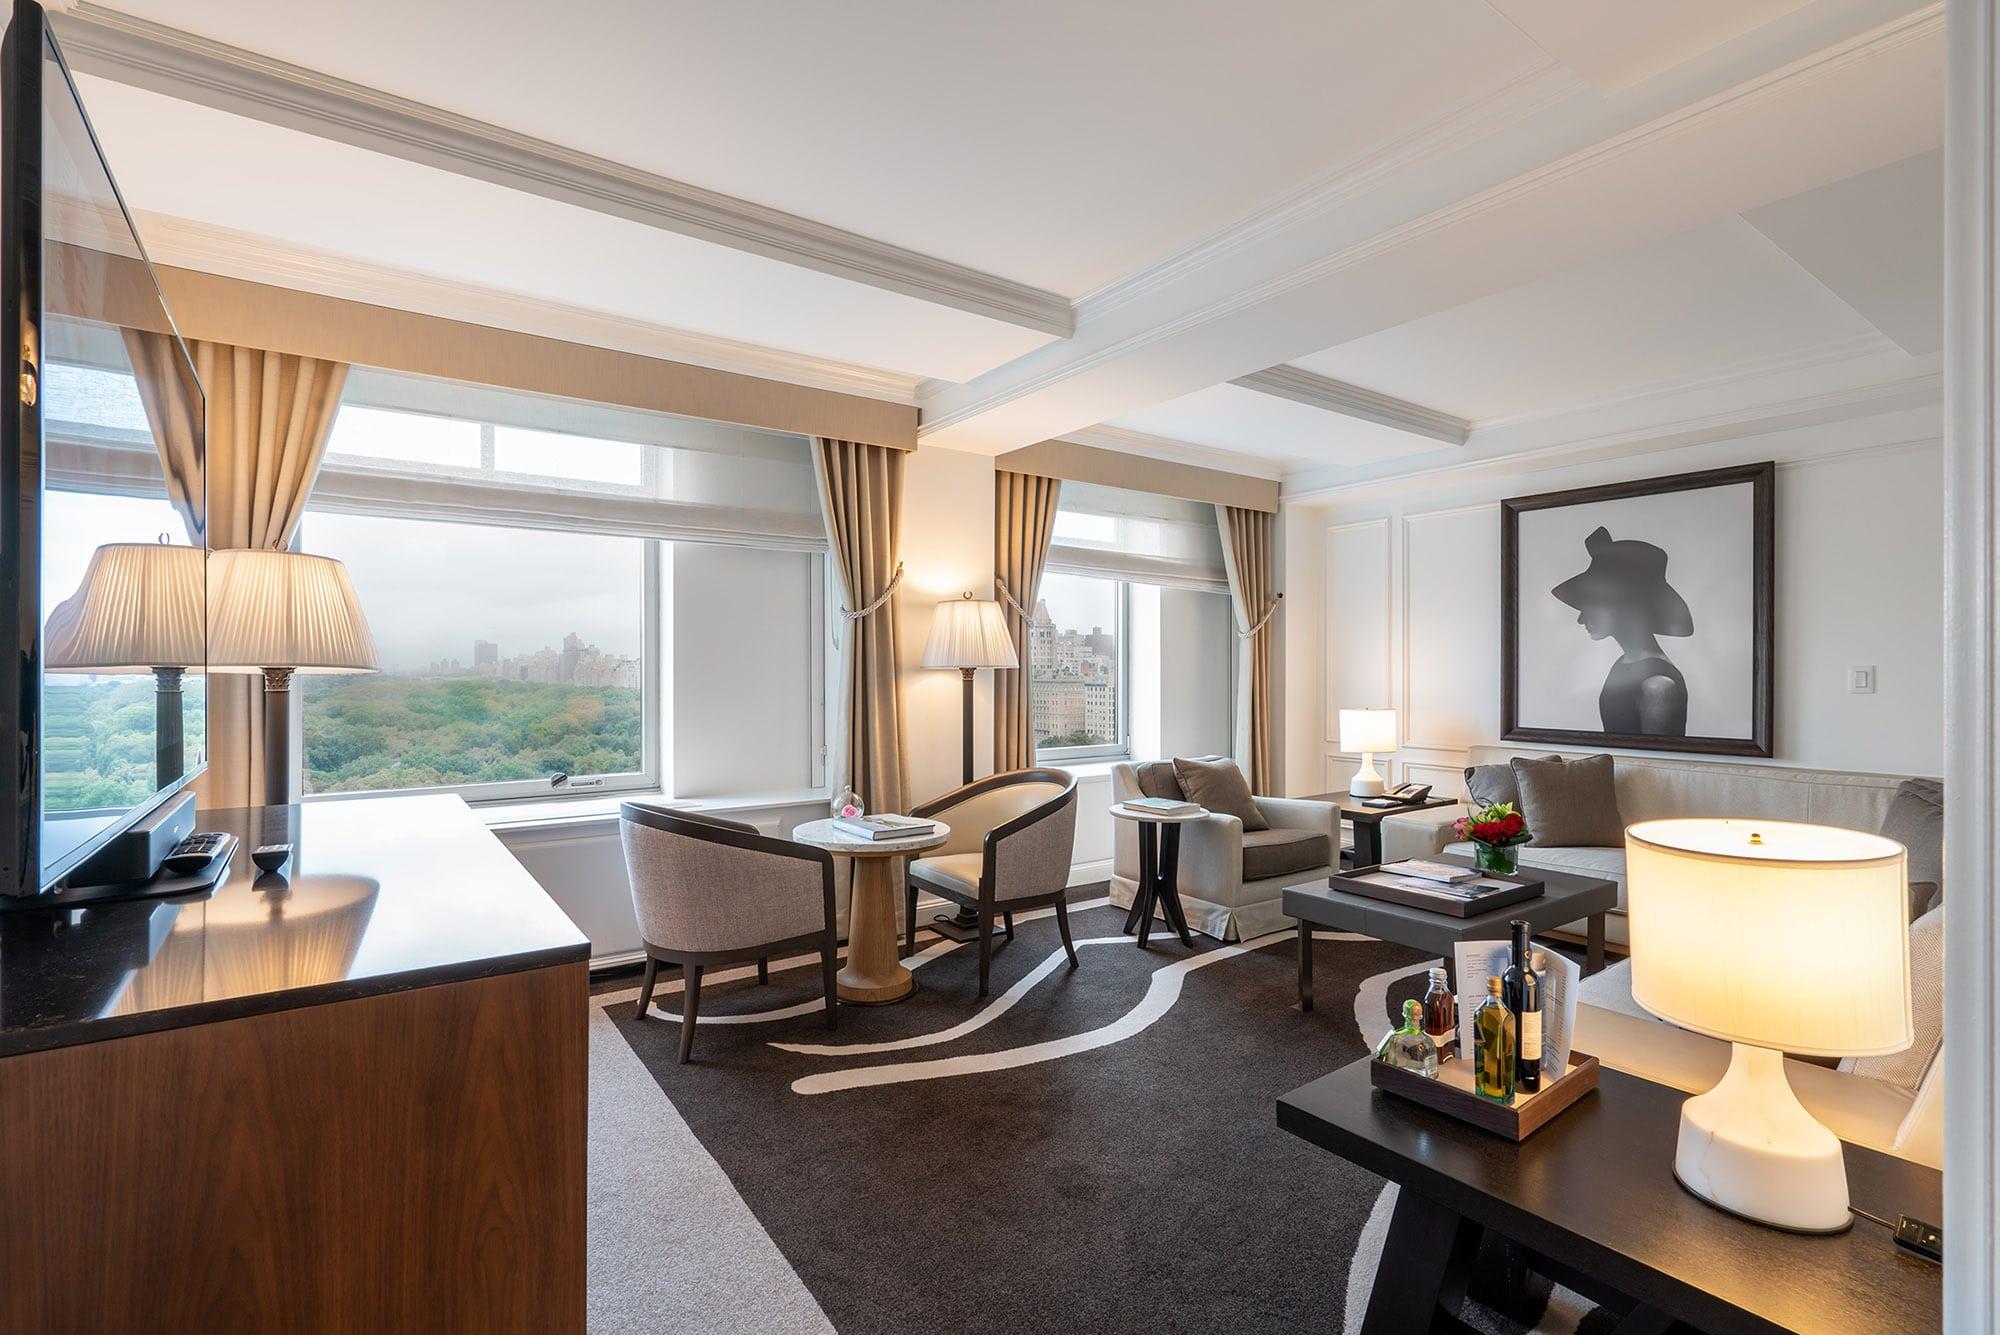 Ritz-Carlton New York Central Park, Grand park view suite